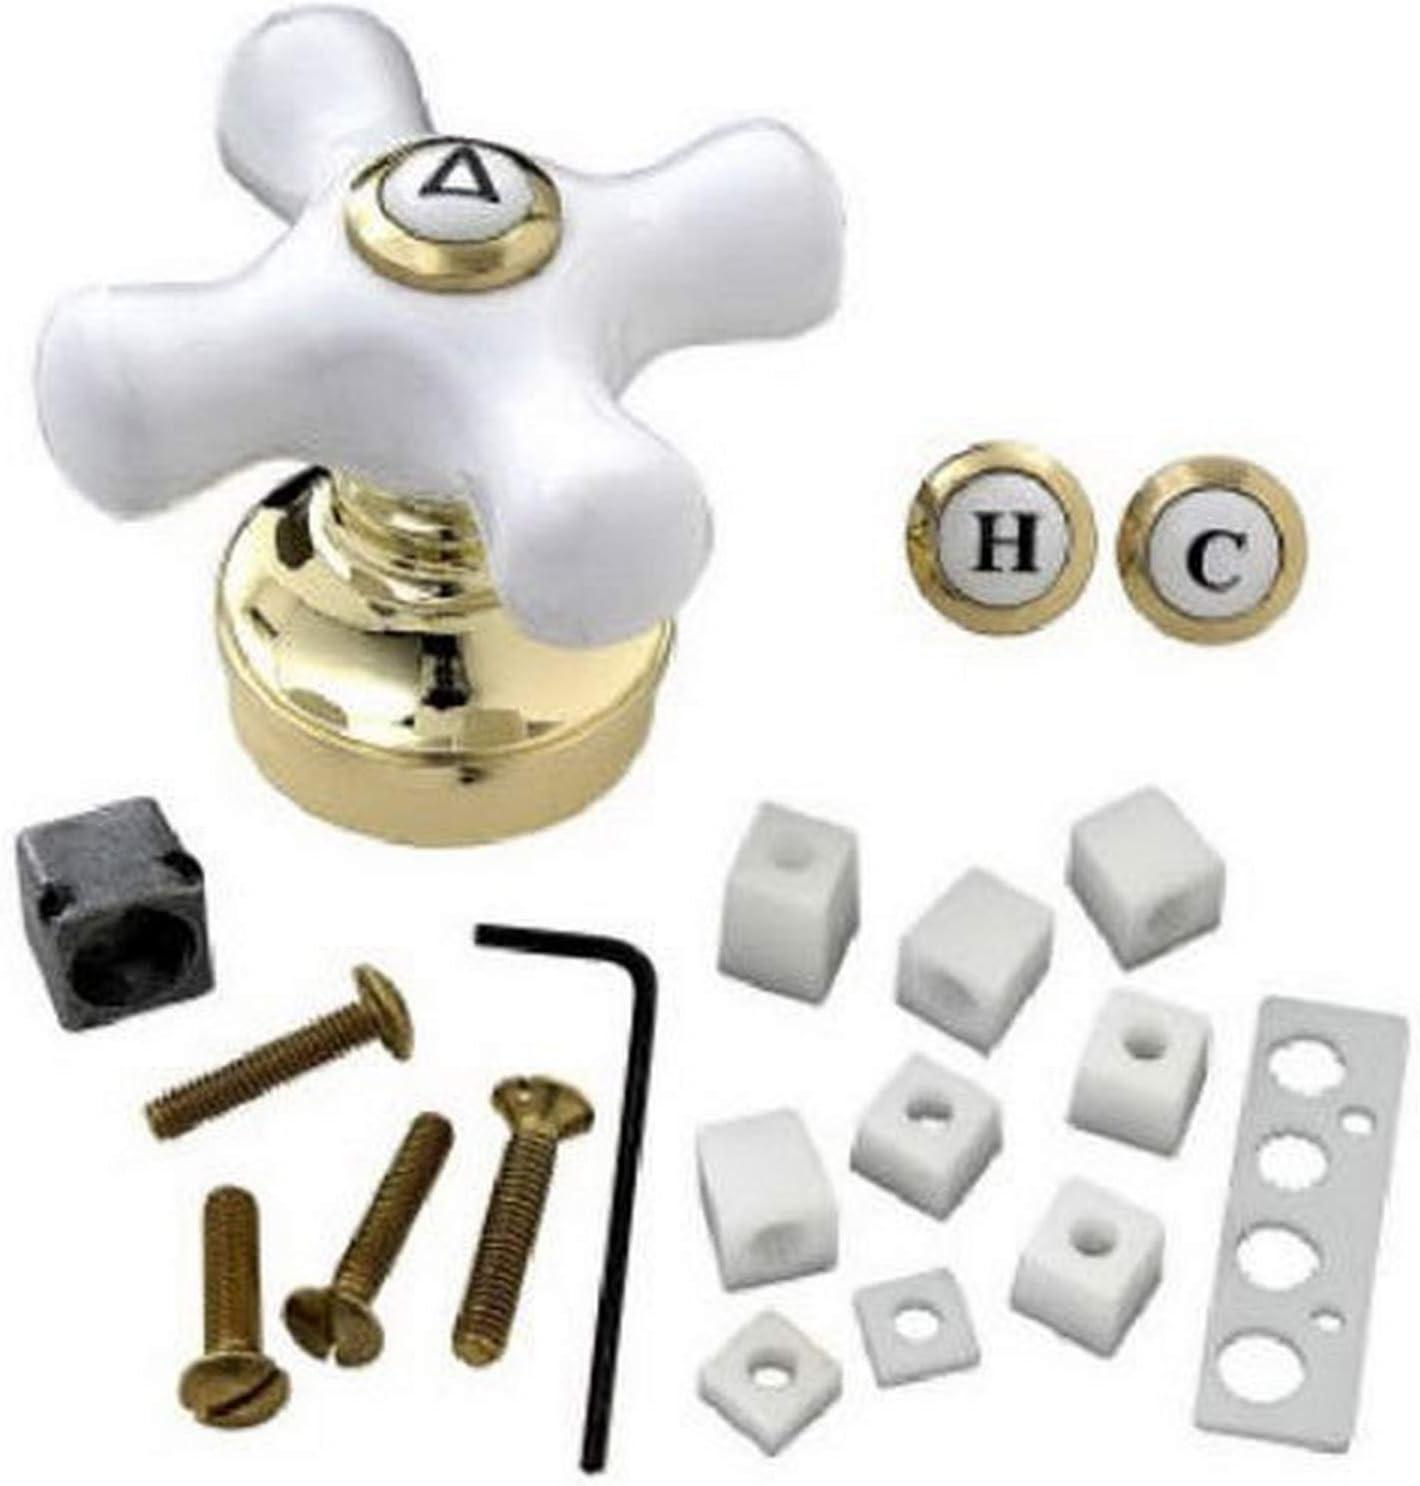 BrassCraft SH5740 Handle PB CROSS HNDL WHITE DESIGN Elegant TIP FAUCET Minneapolis Mall